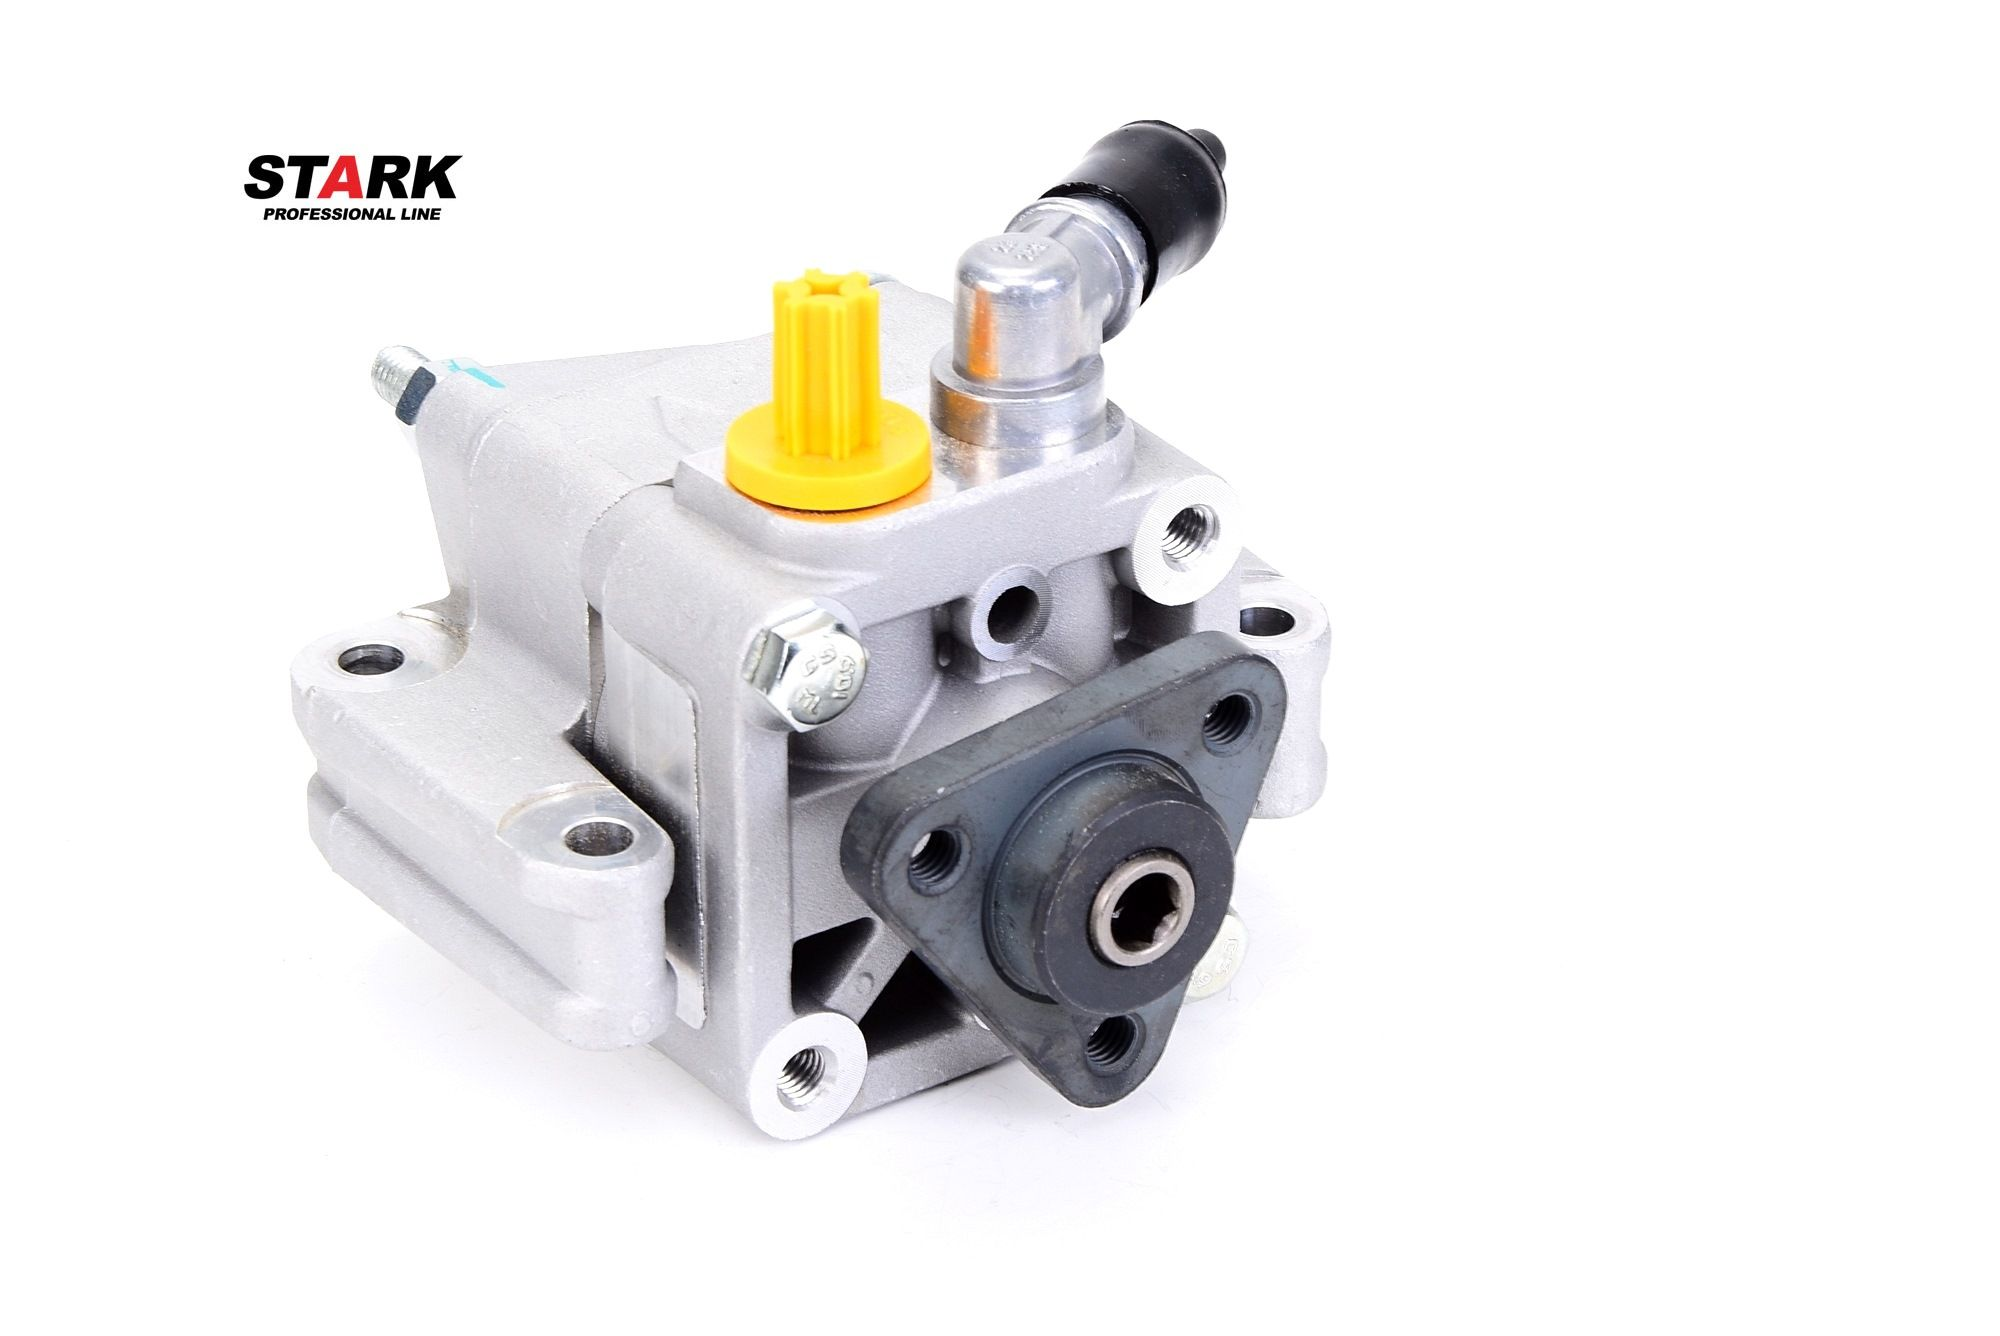 Servo pump STARK SKHP-0540029 rating